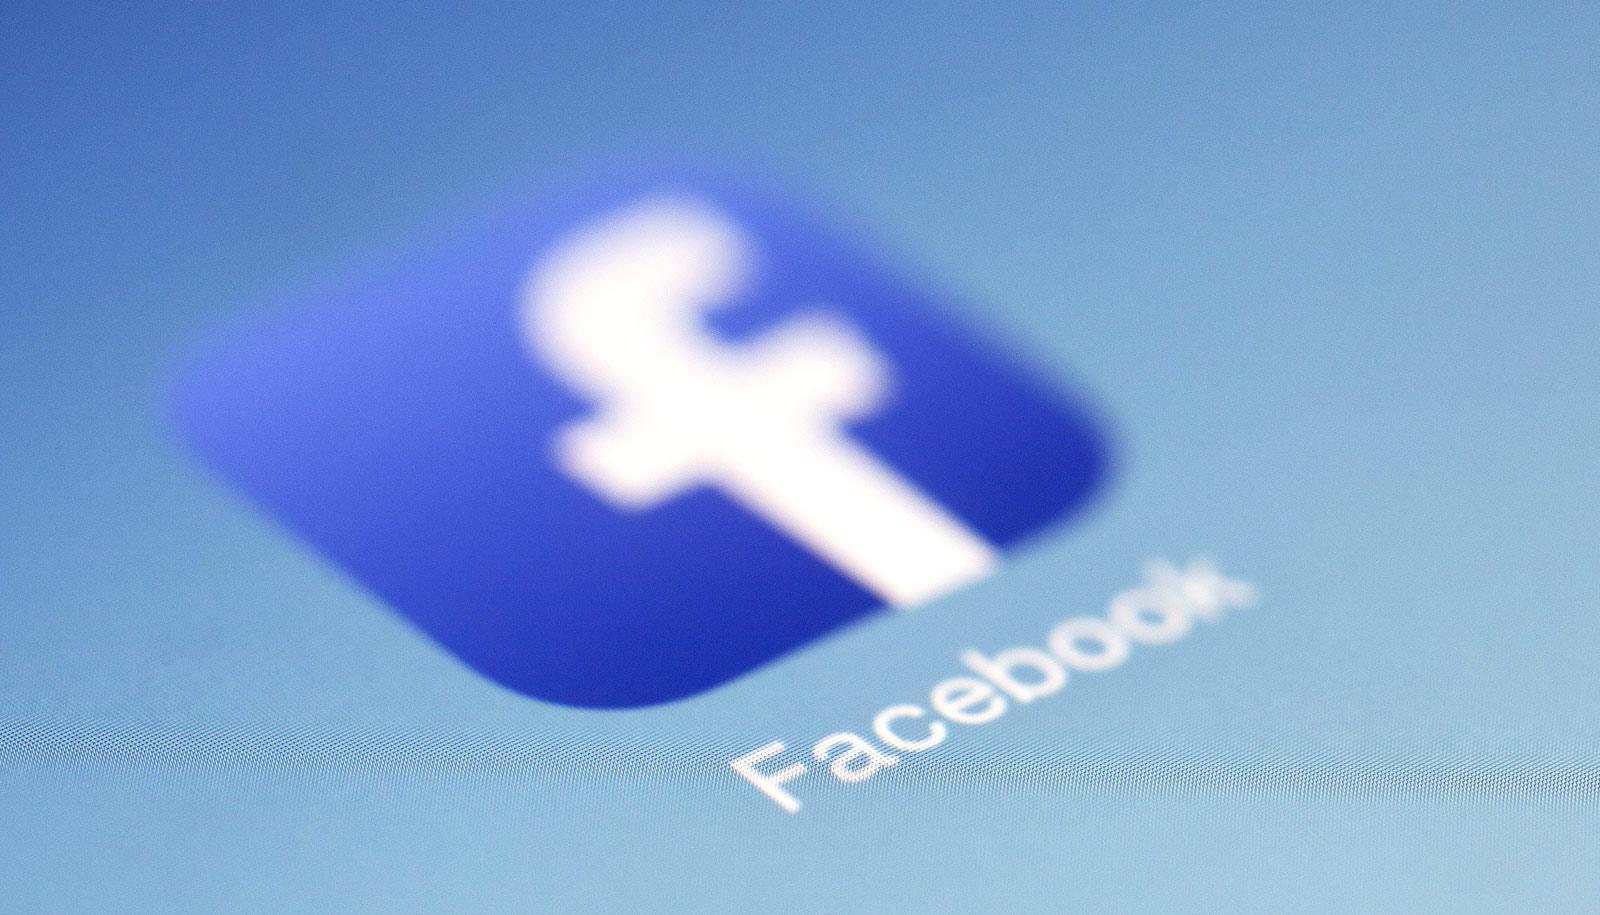 blur on Facebook logo -- facebook posts